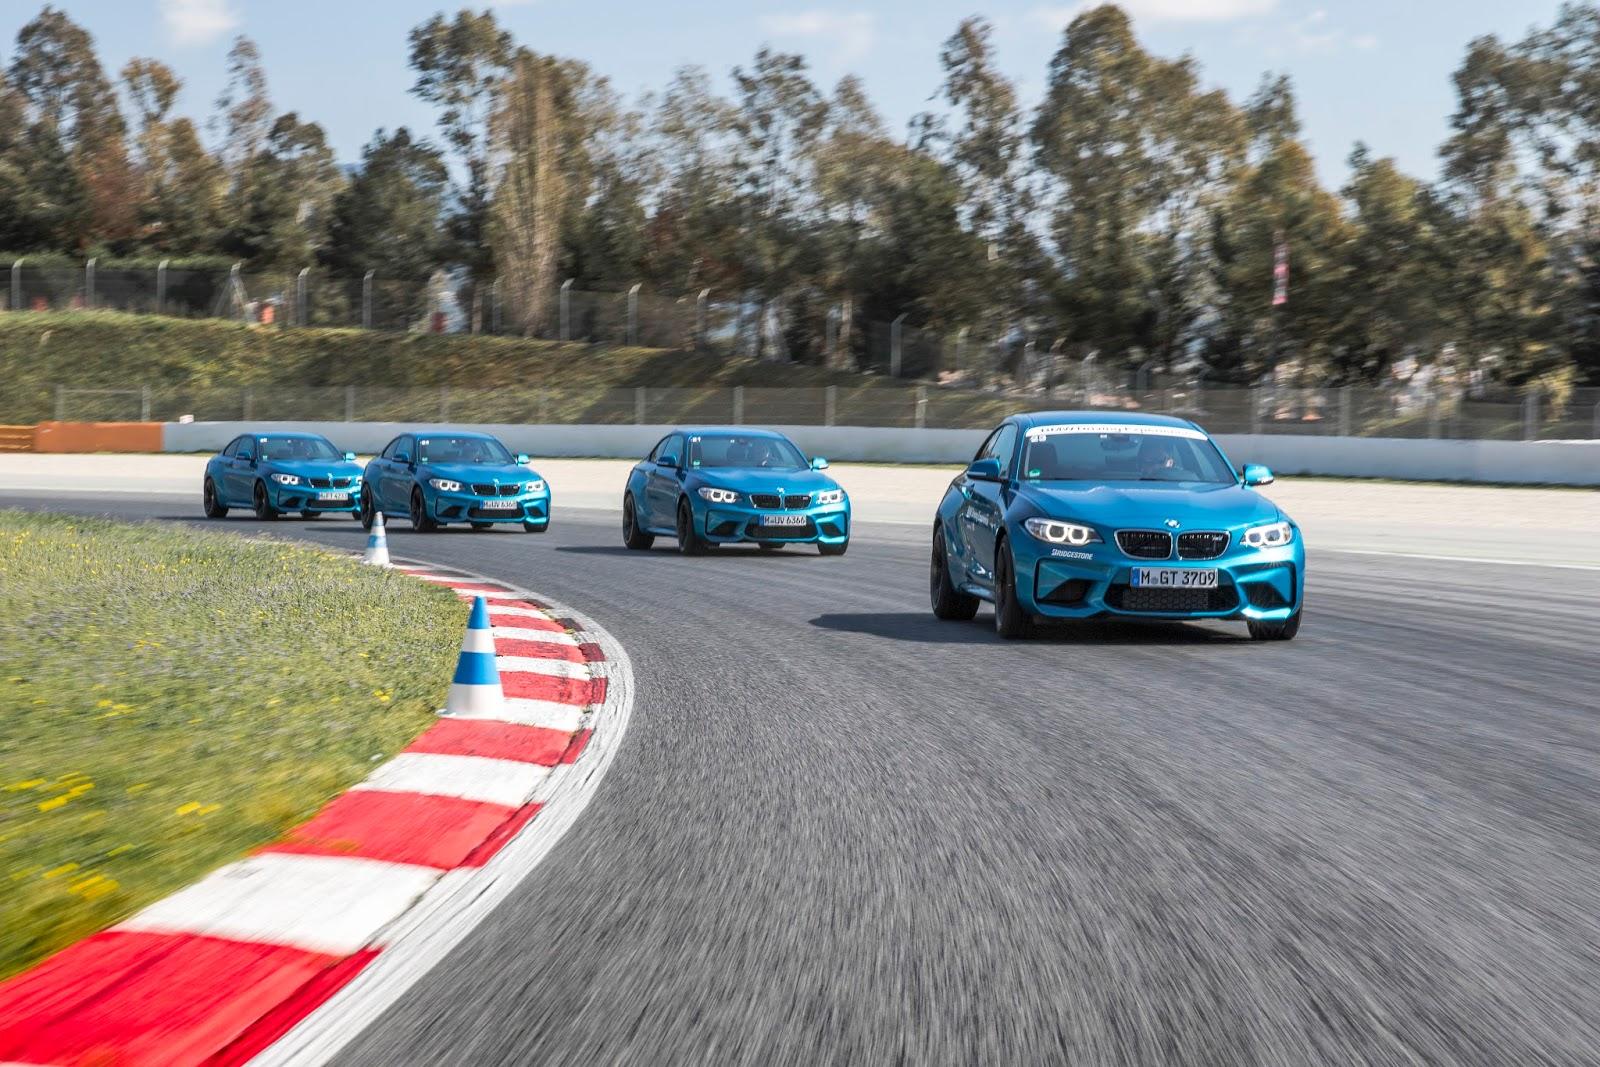 P90254179 highRes bmw mini driving ex 1 Γίνε καλύτερος οδηγός κάτω από όλες τις συνθήκες, με Bmw και Mini BMW, BMW i, BMW M, Driver, Driving Skills, Safety, οδήγηση, οδηγοί